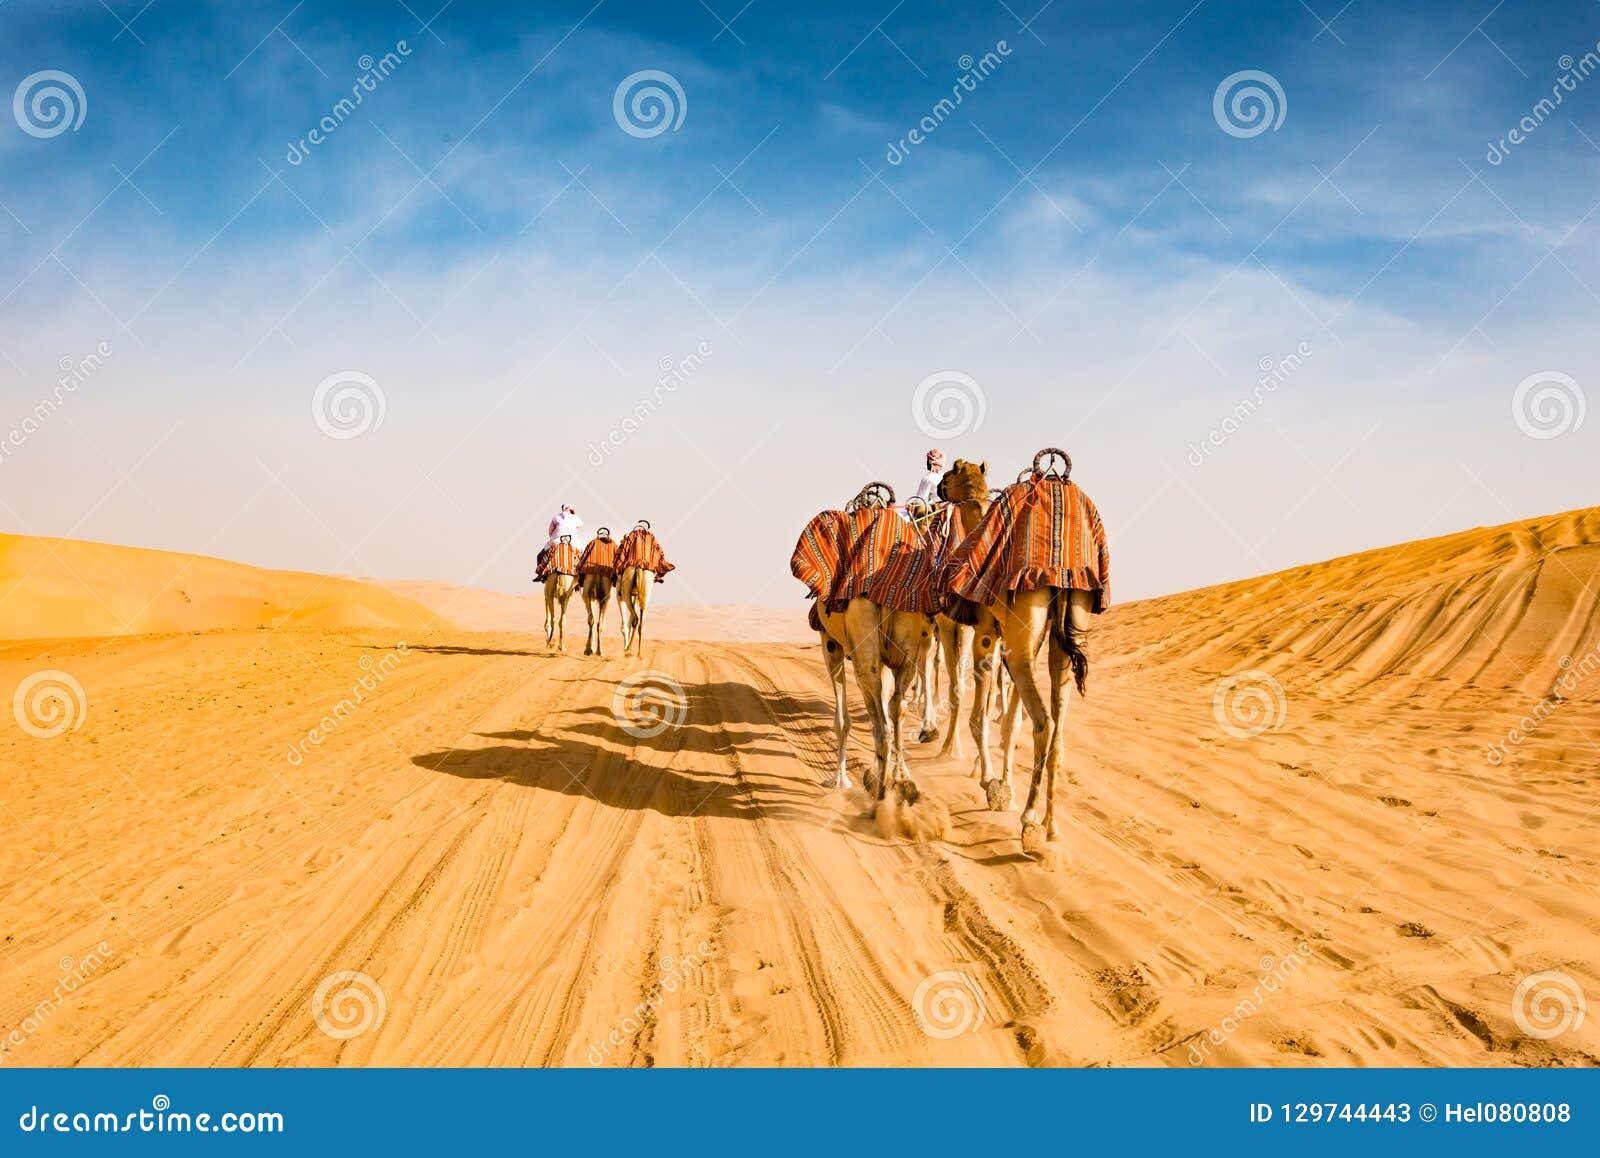 Arabic camels in desert of Abu Dhabi, U.A.E.,